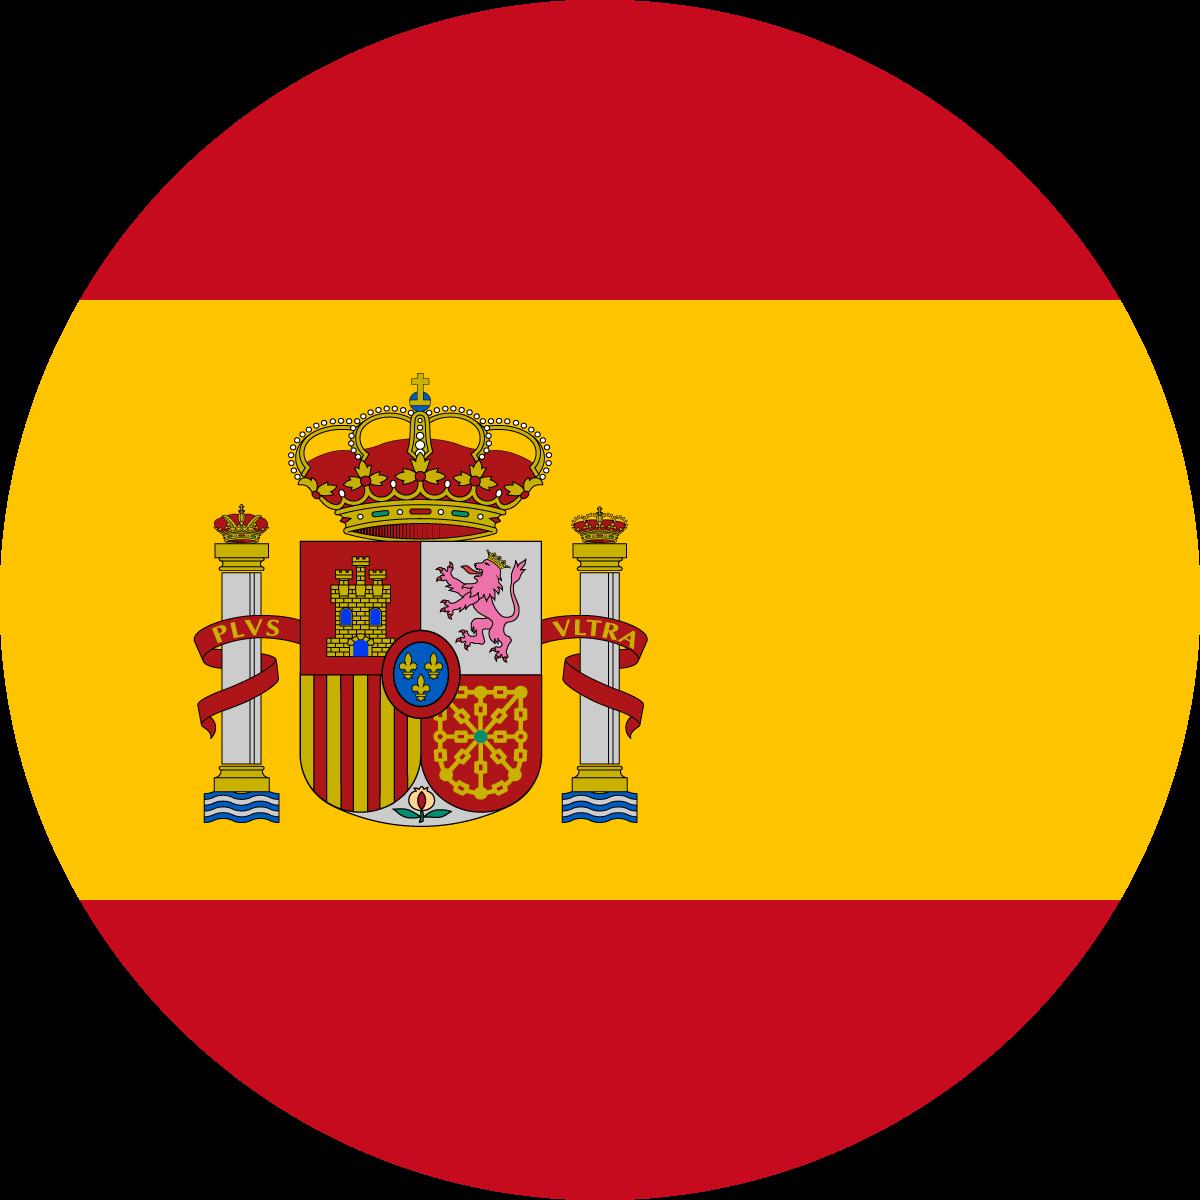 Copy of Copy of Copy of Copy of Copy of Copy of Copy of Copy of Copy of Copy of Copy of Spain